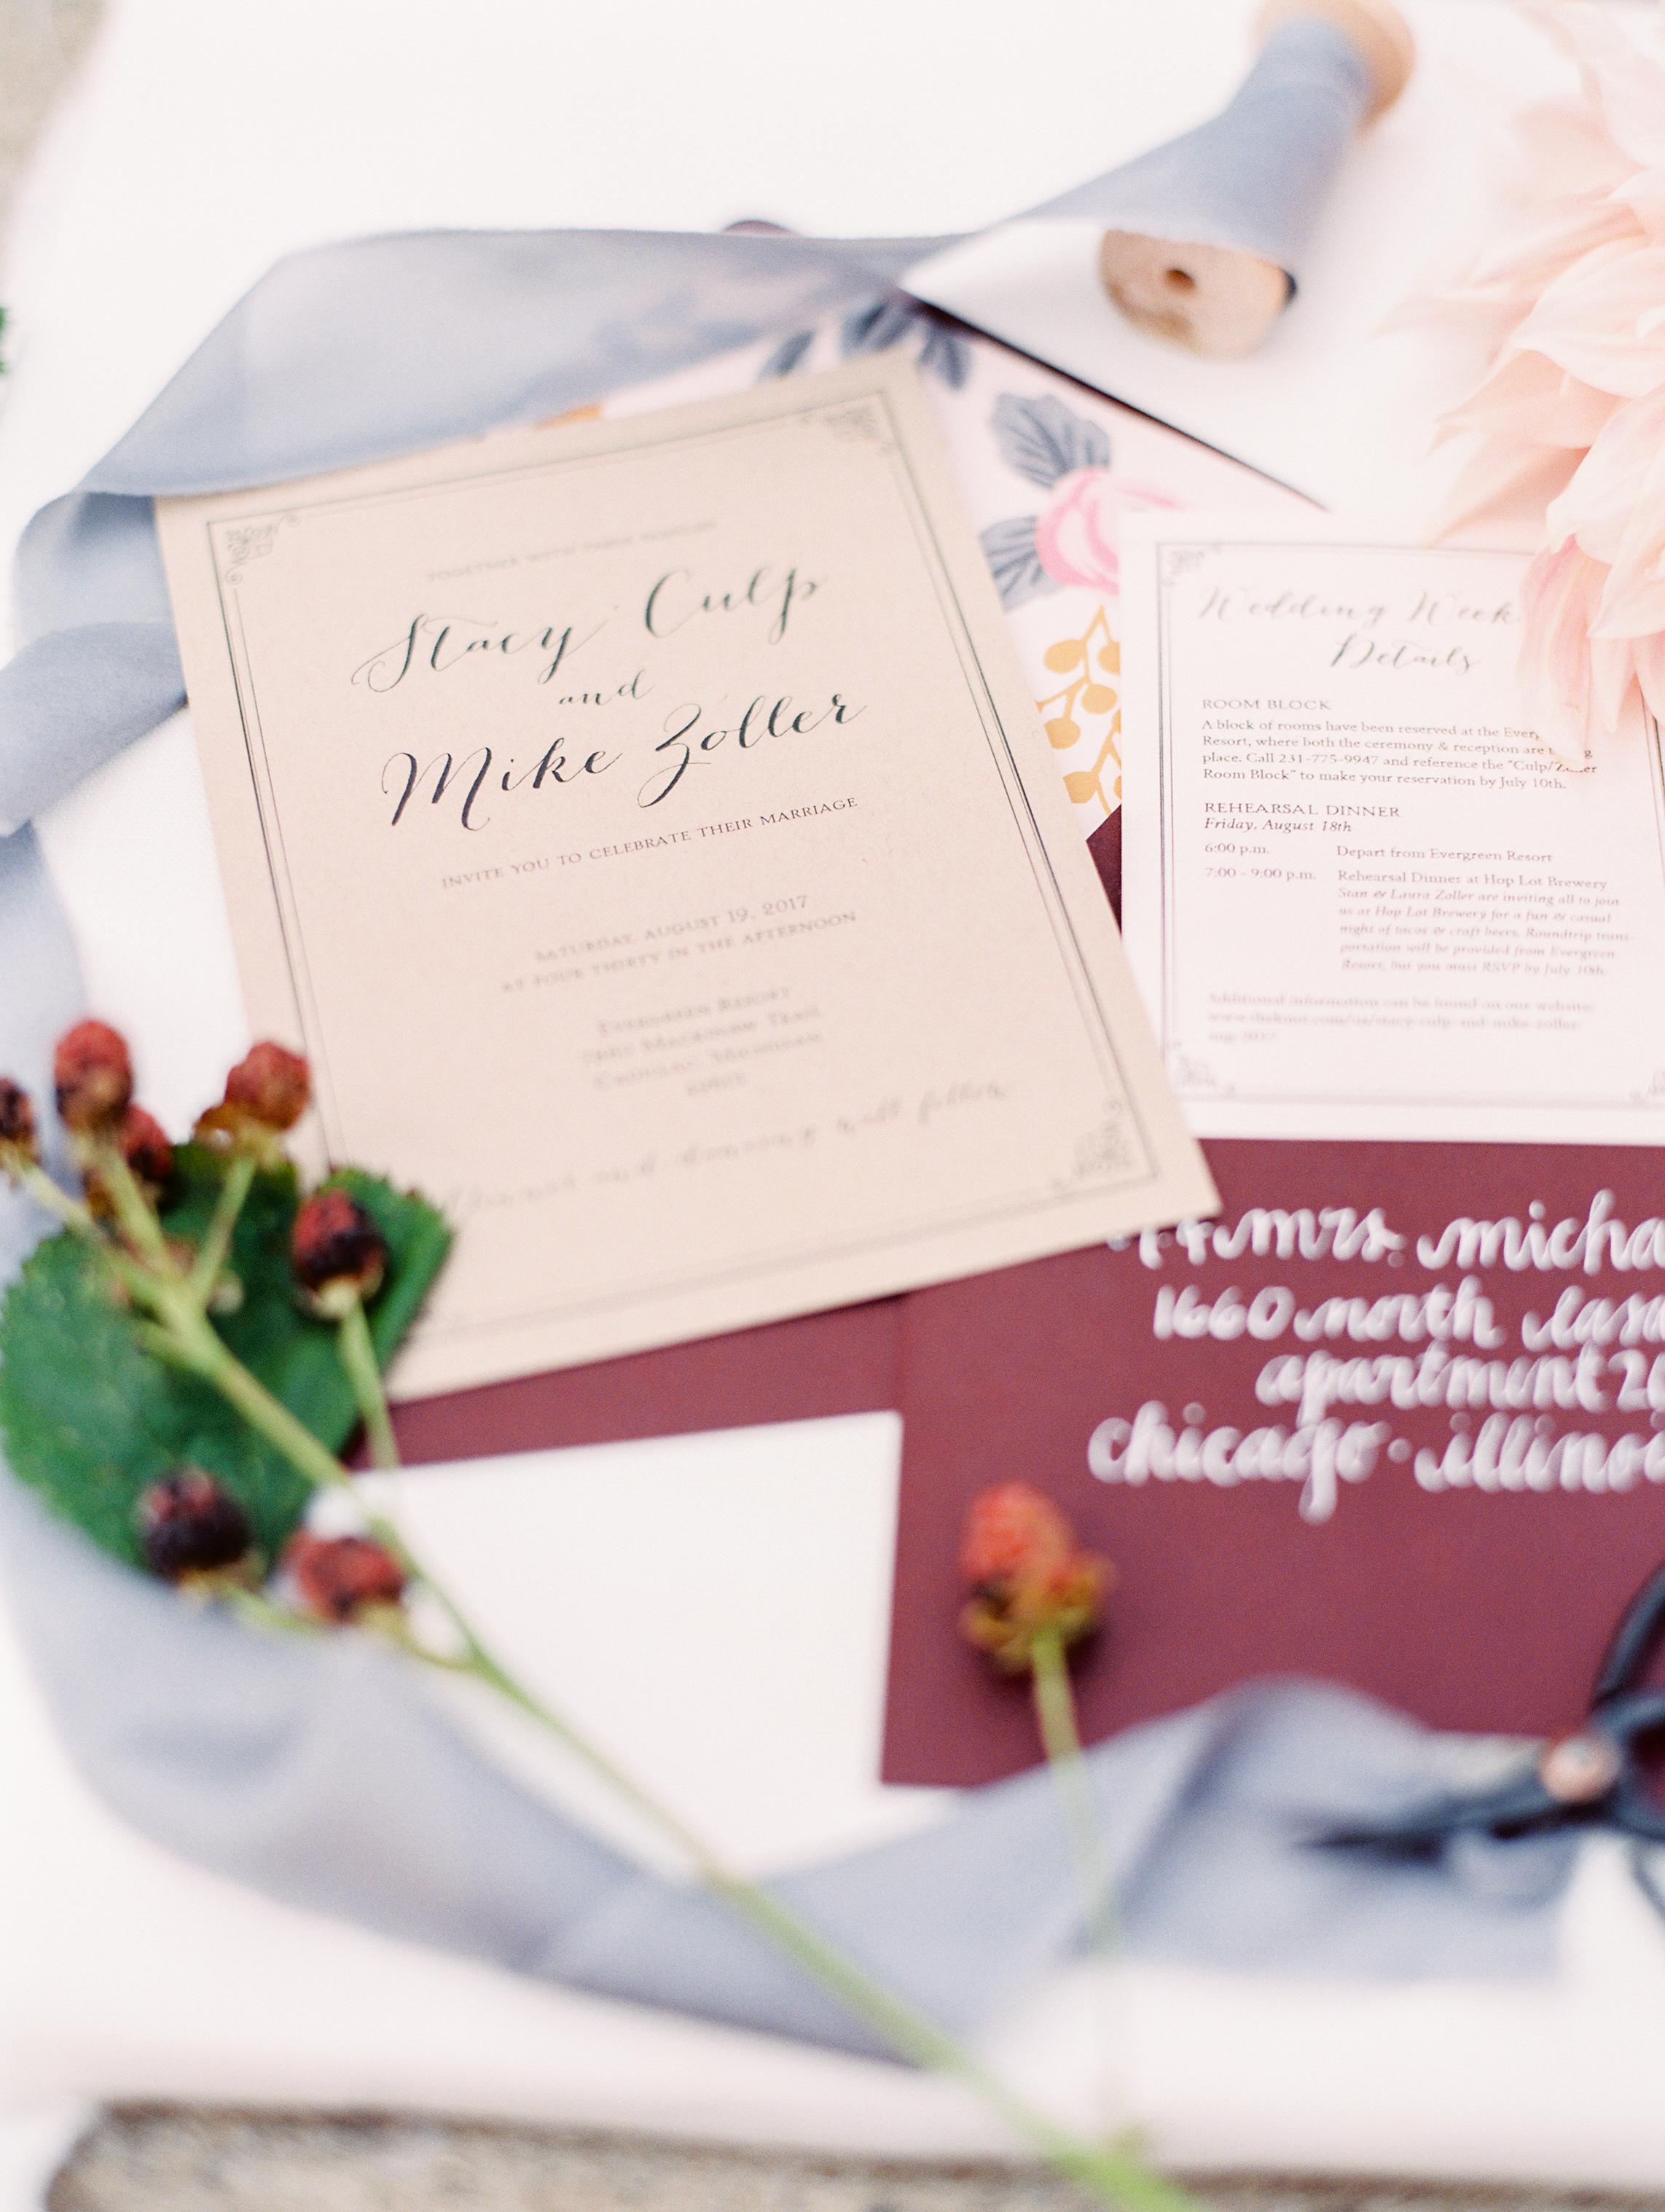 Zoller+Wedding+Details-30.jpg